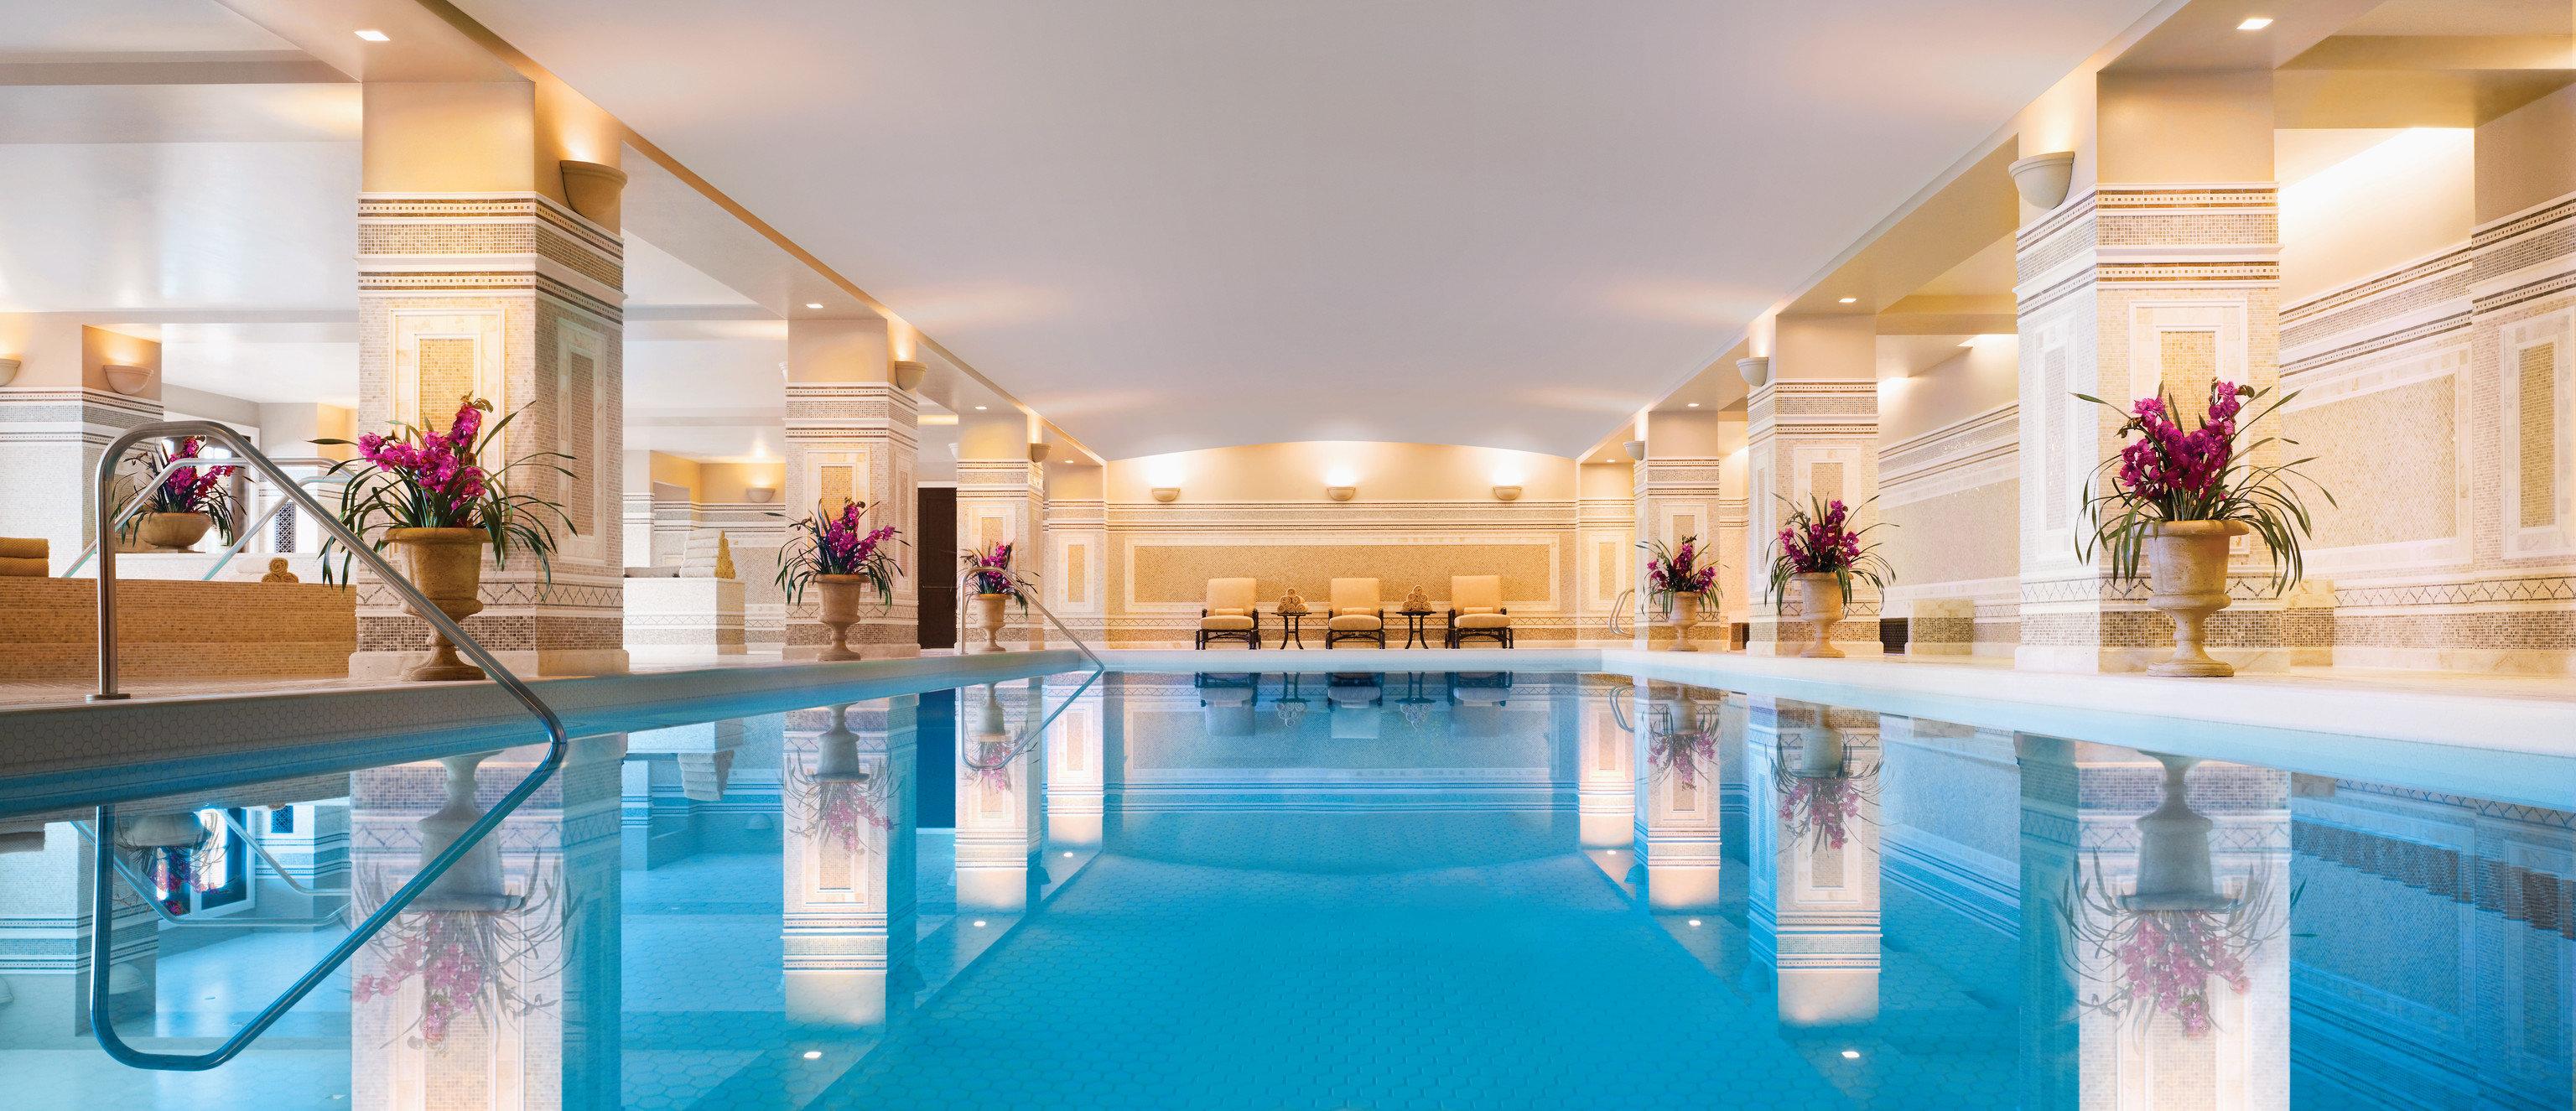 Trip Ideas indoor swimming pool leisure ceiling estate Resort function hall